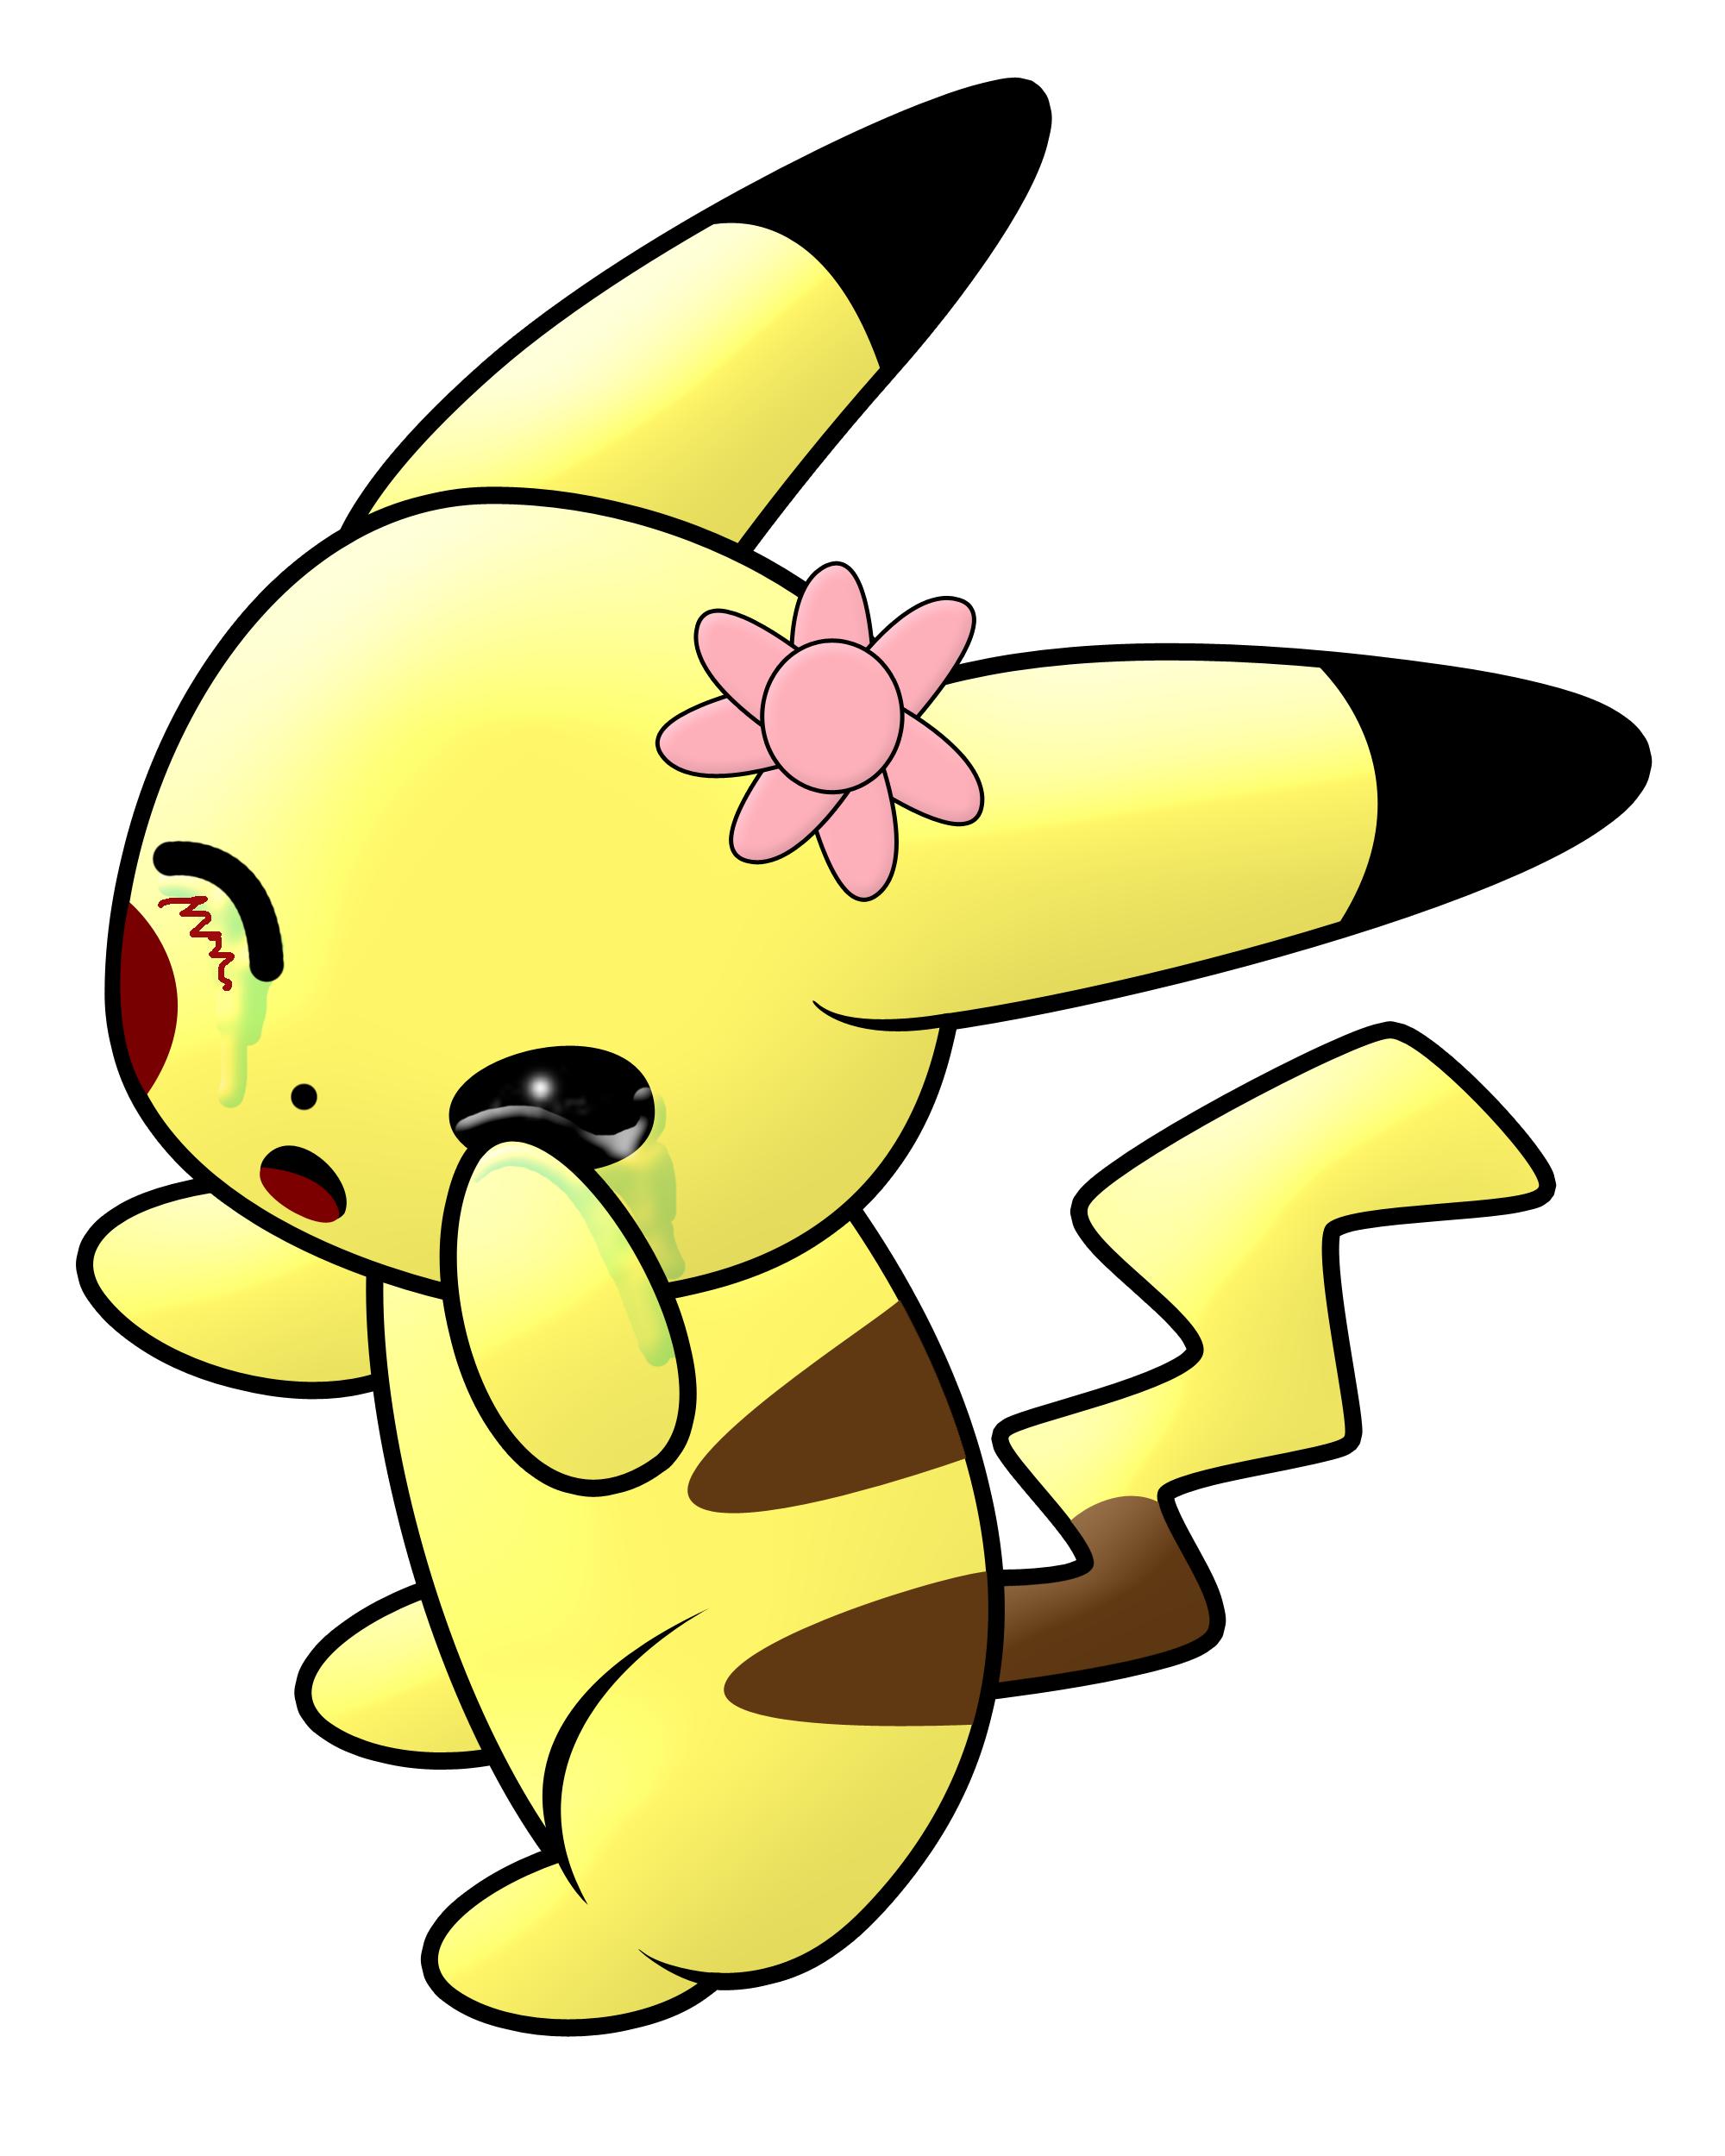 Pikachu crying drawing - photo#23